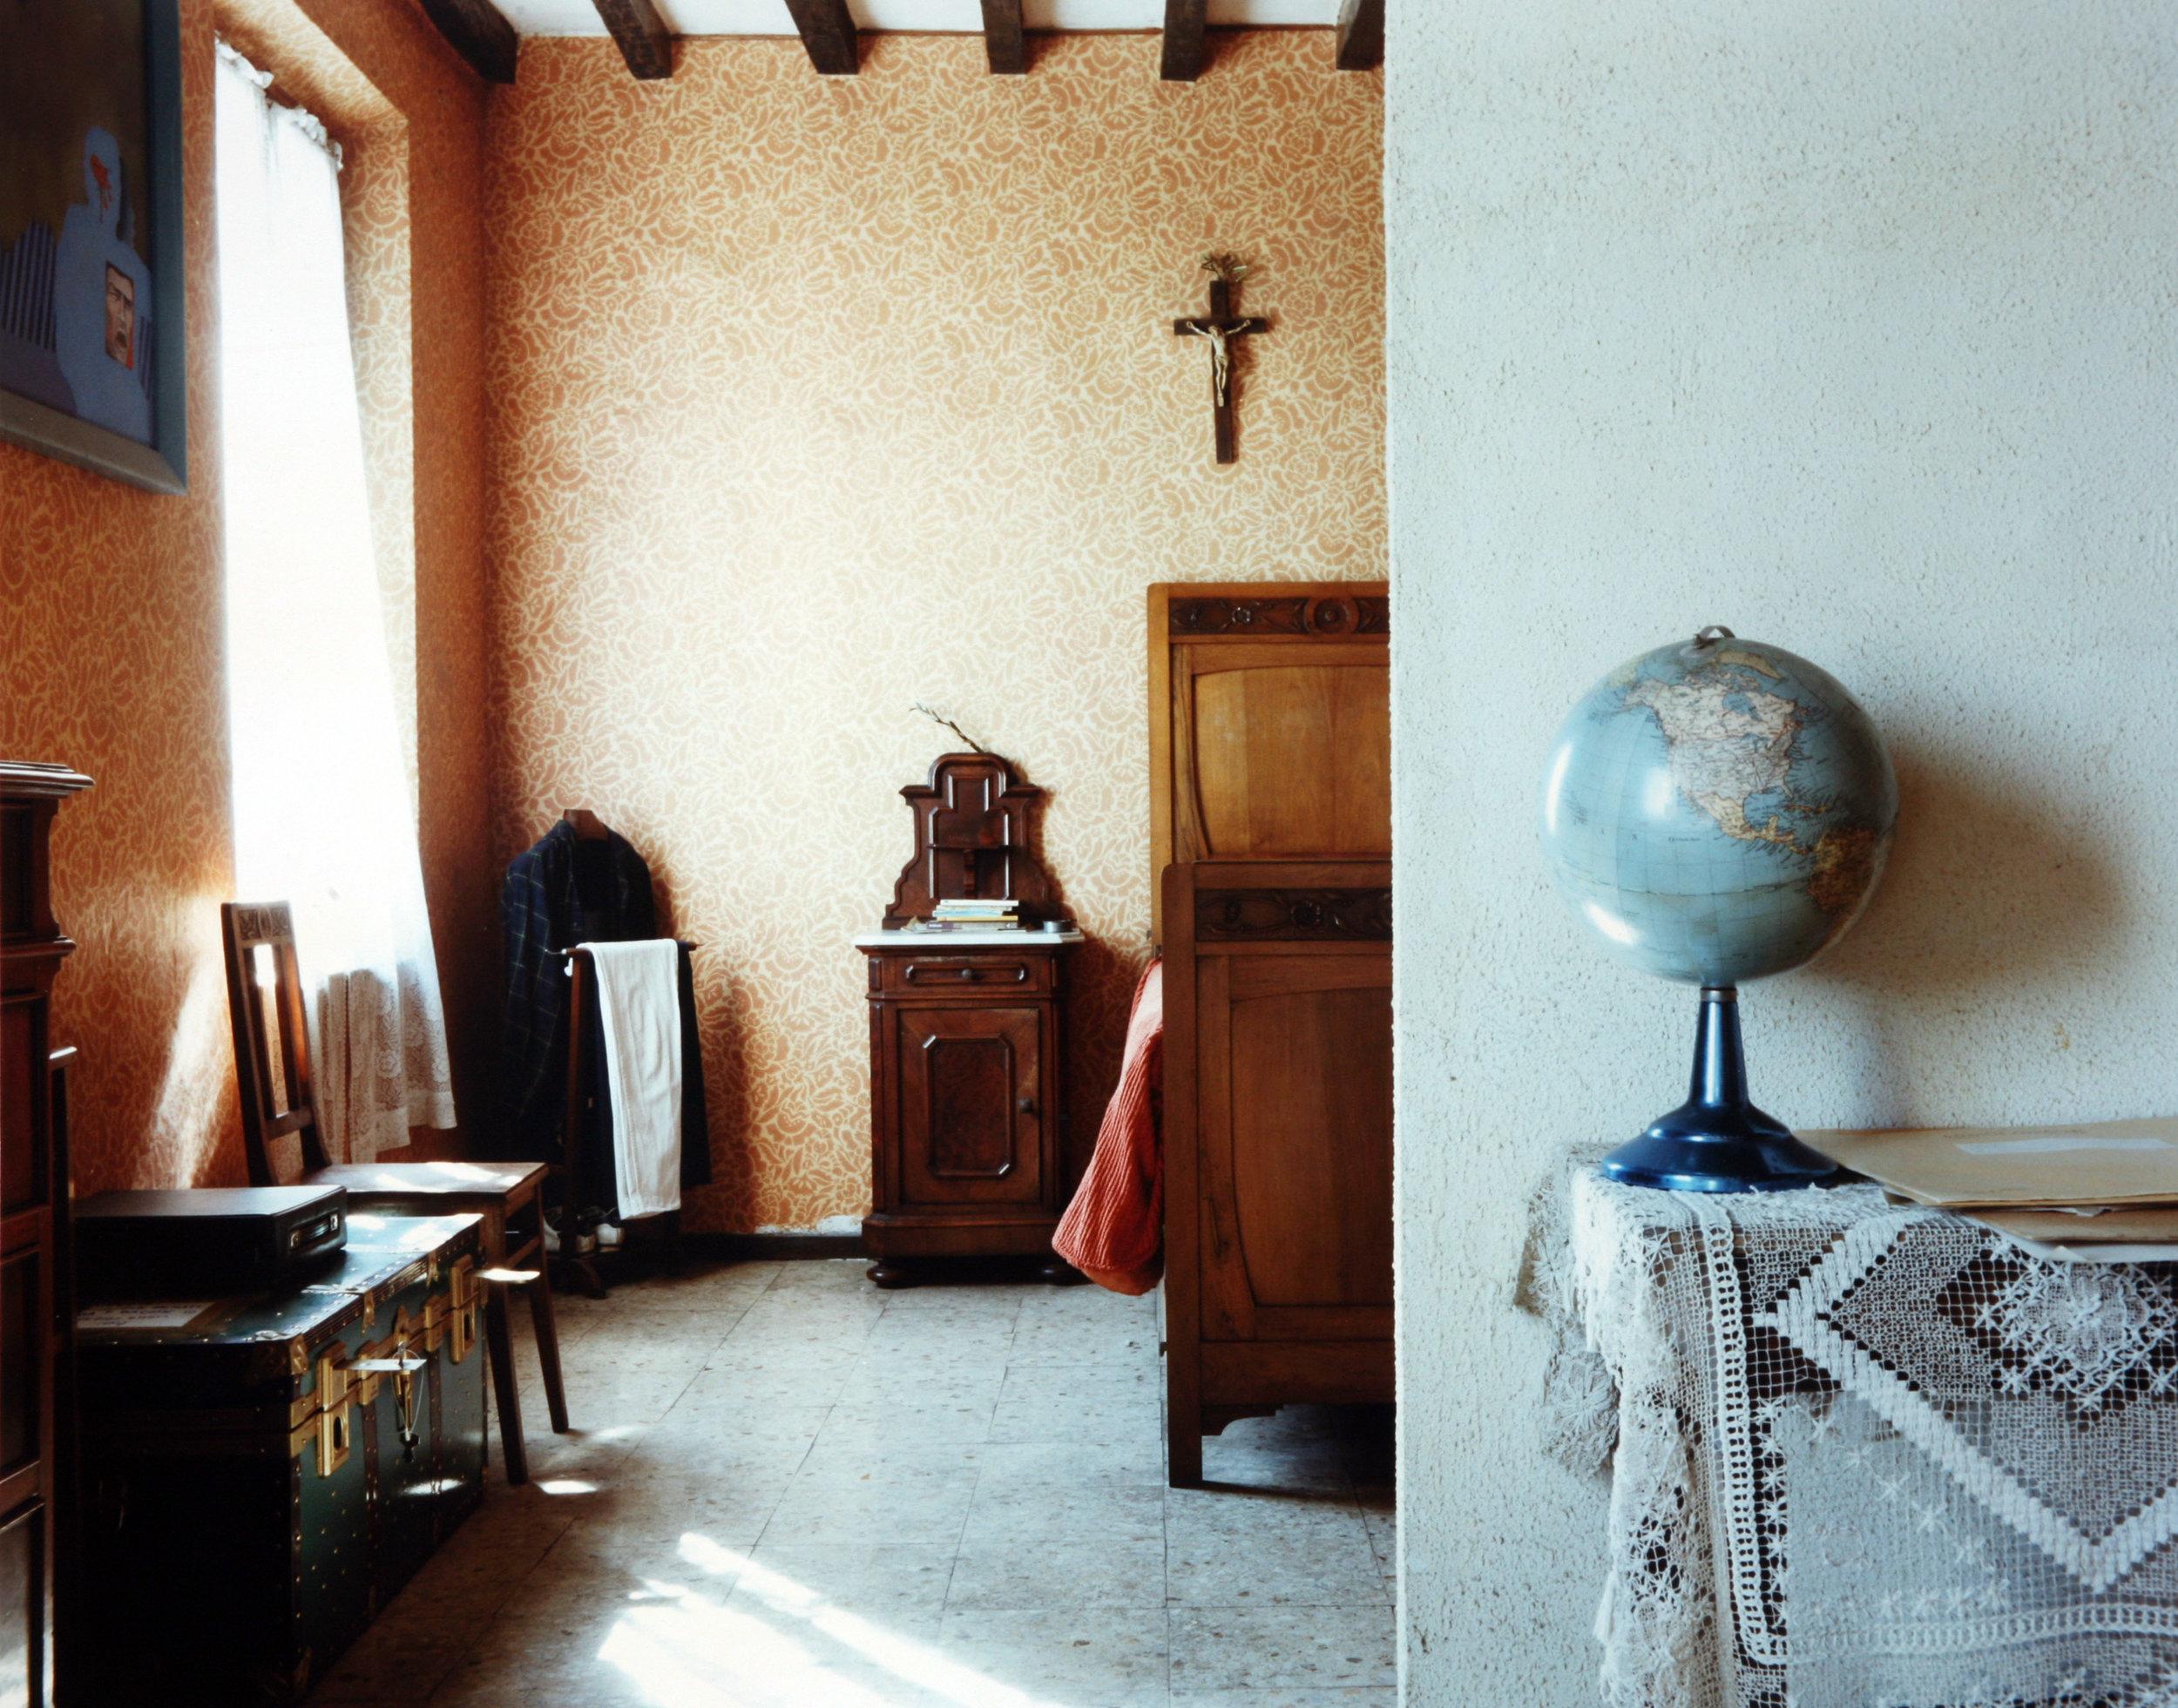 Photographica-FineArt_Casa-Benati_1985.JPG